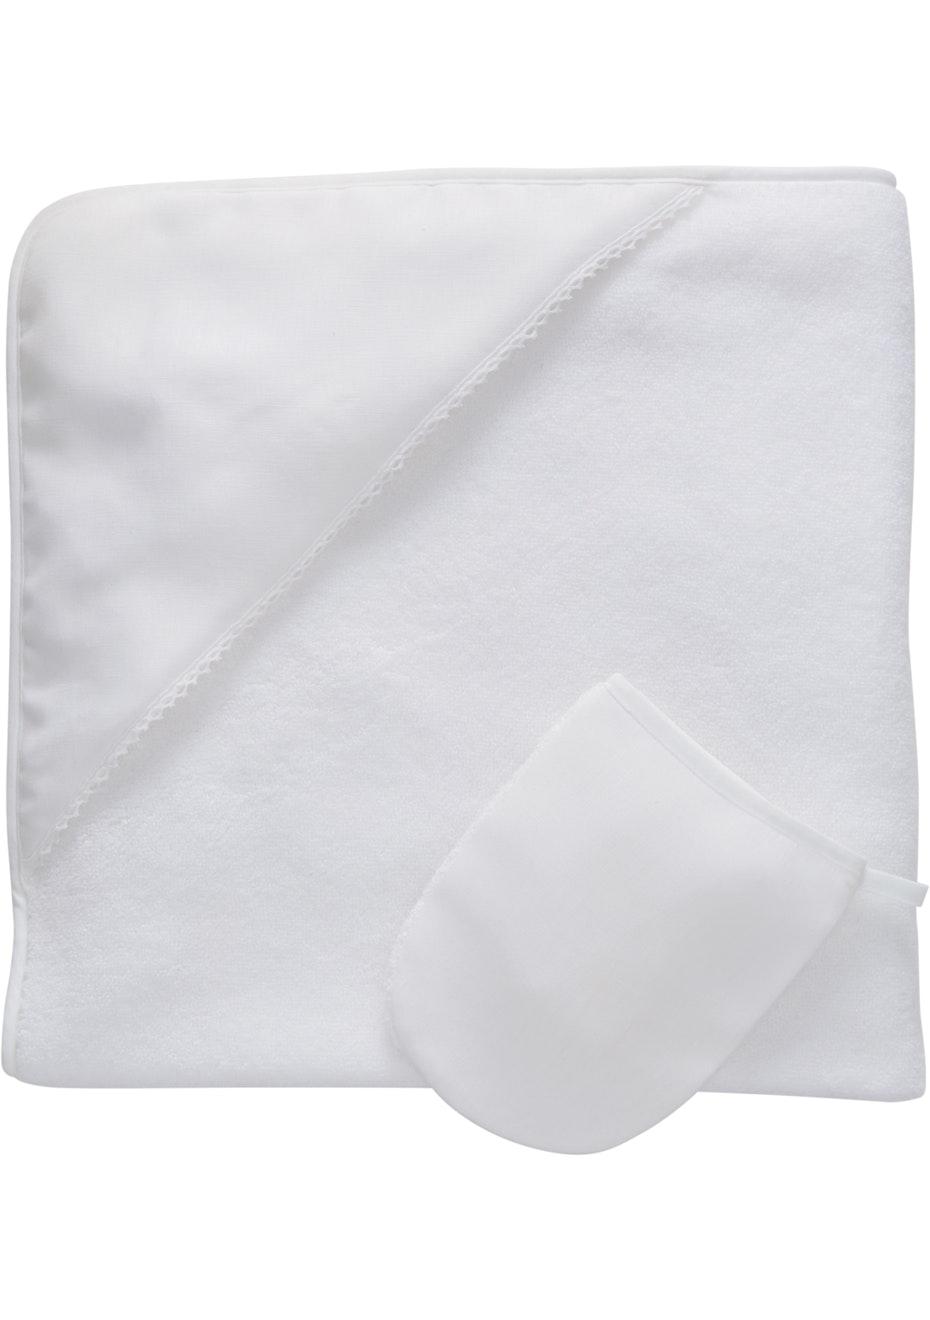 Sheridan - Quinn - Towel & Mit Set - White